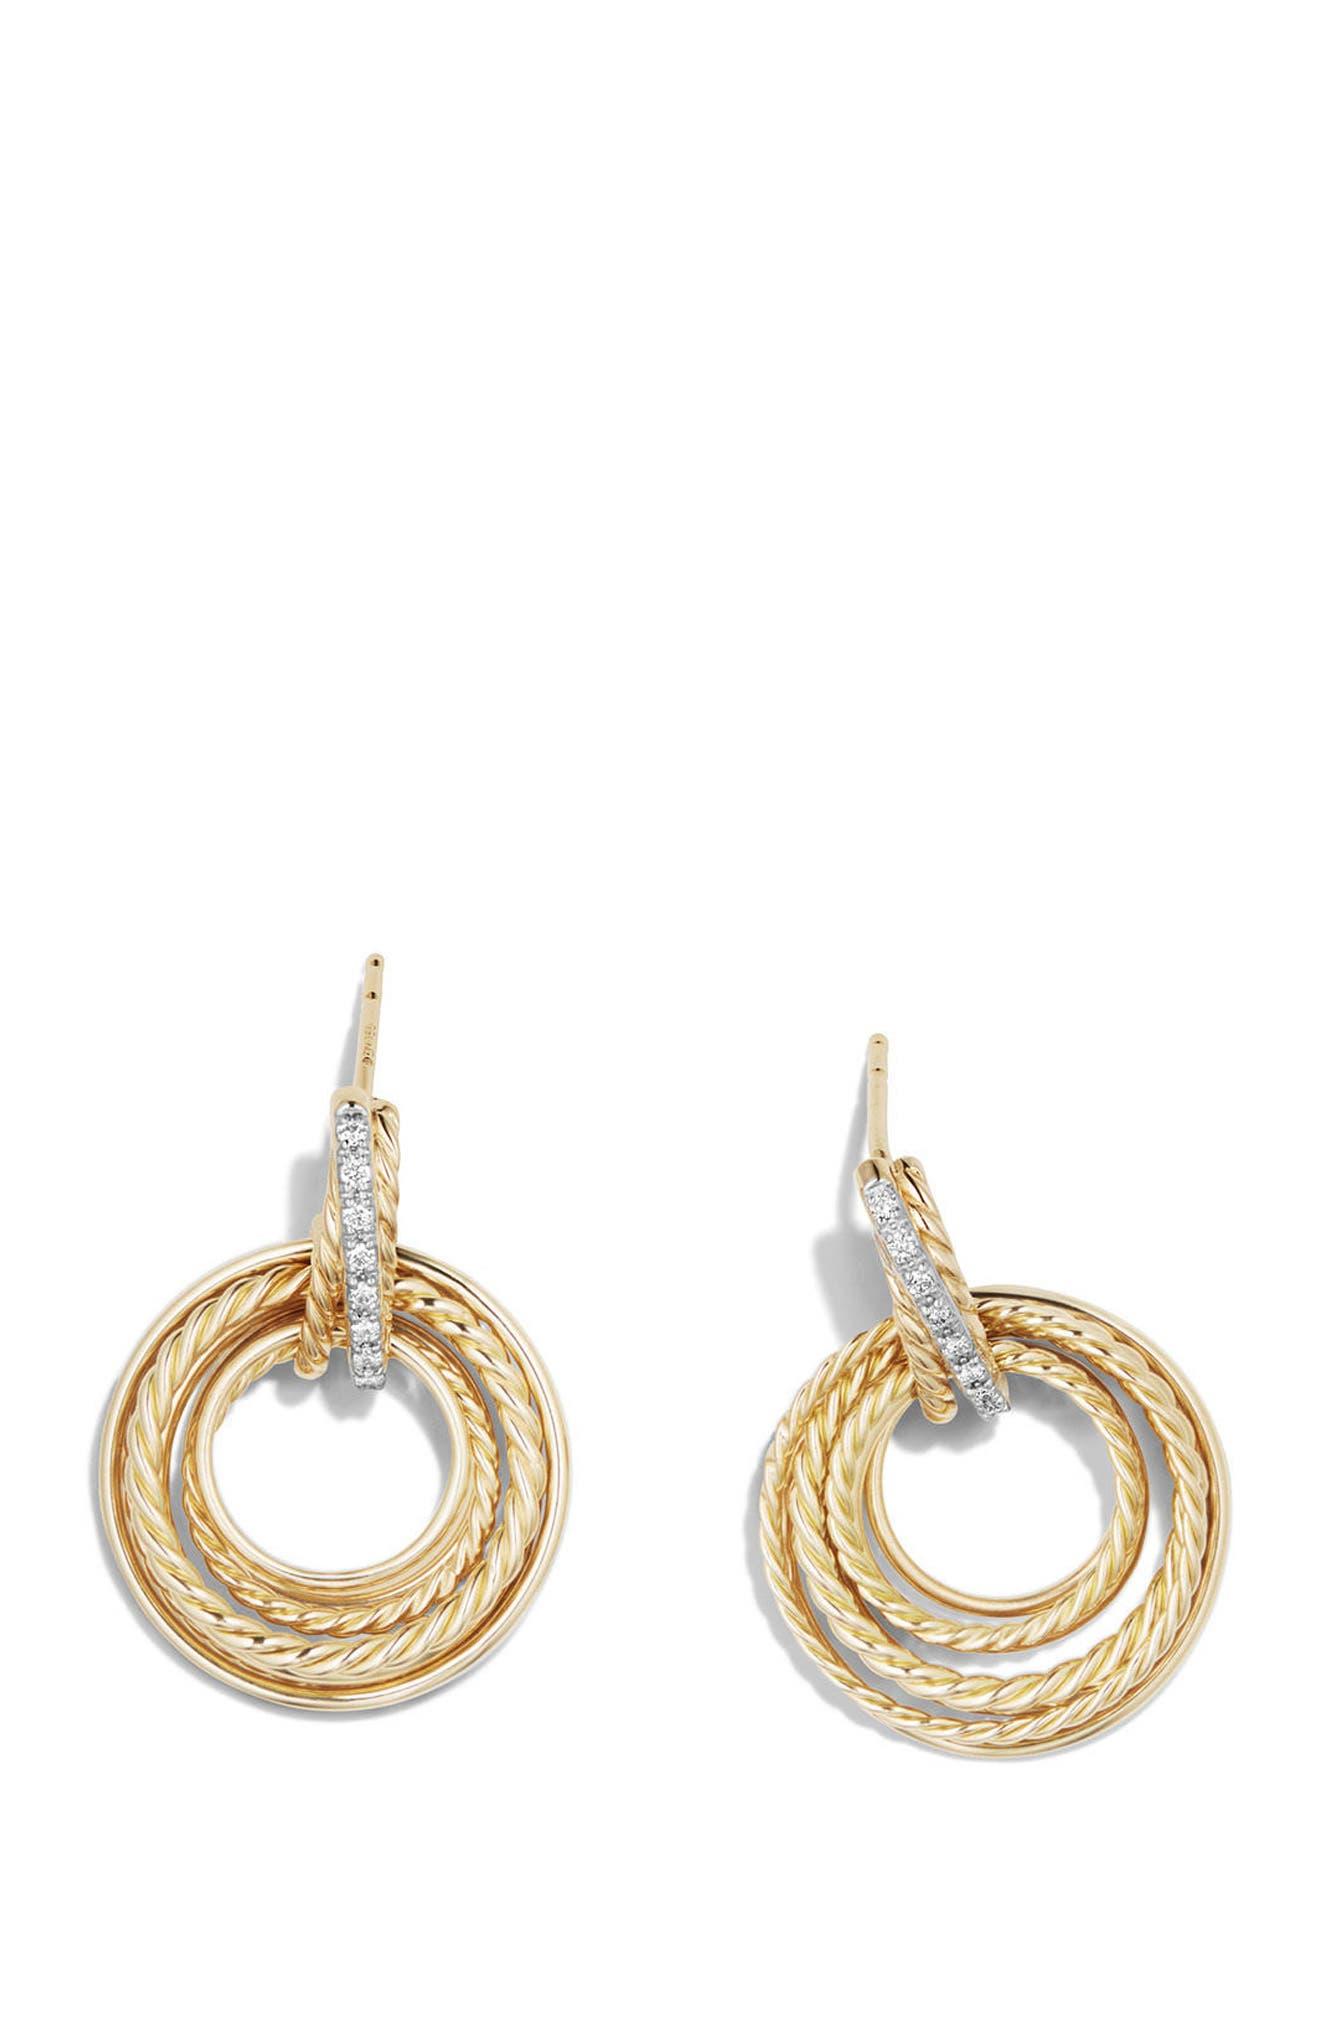 Crossover Diamond Drop Earrings,                             Alternate thumbnail 2, color,                             YELLOW GOLD/ DIAMOND